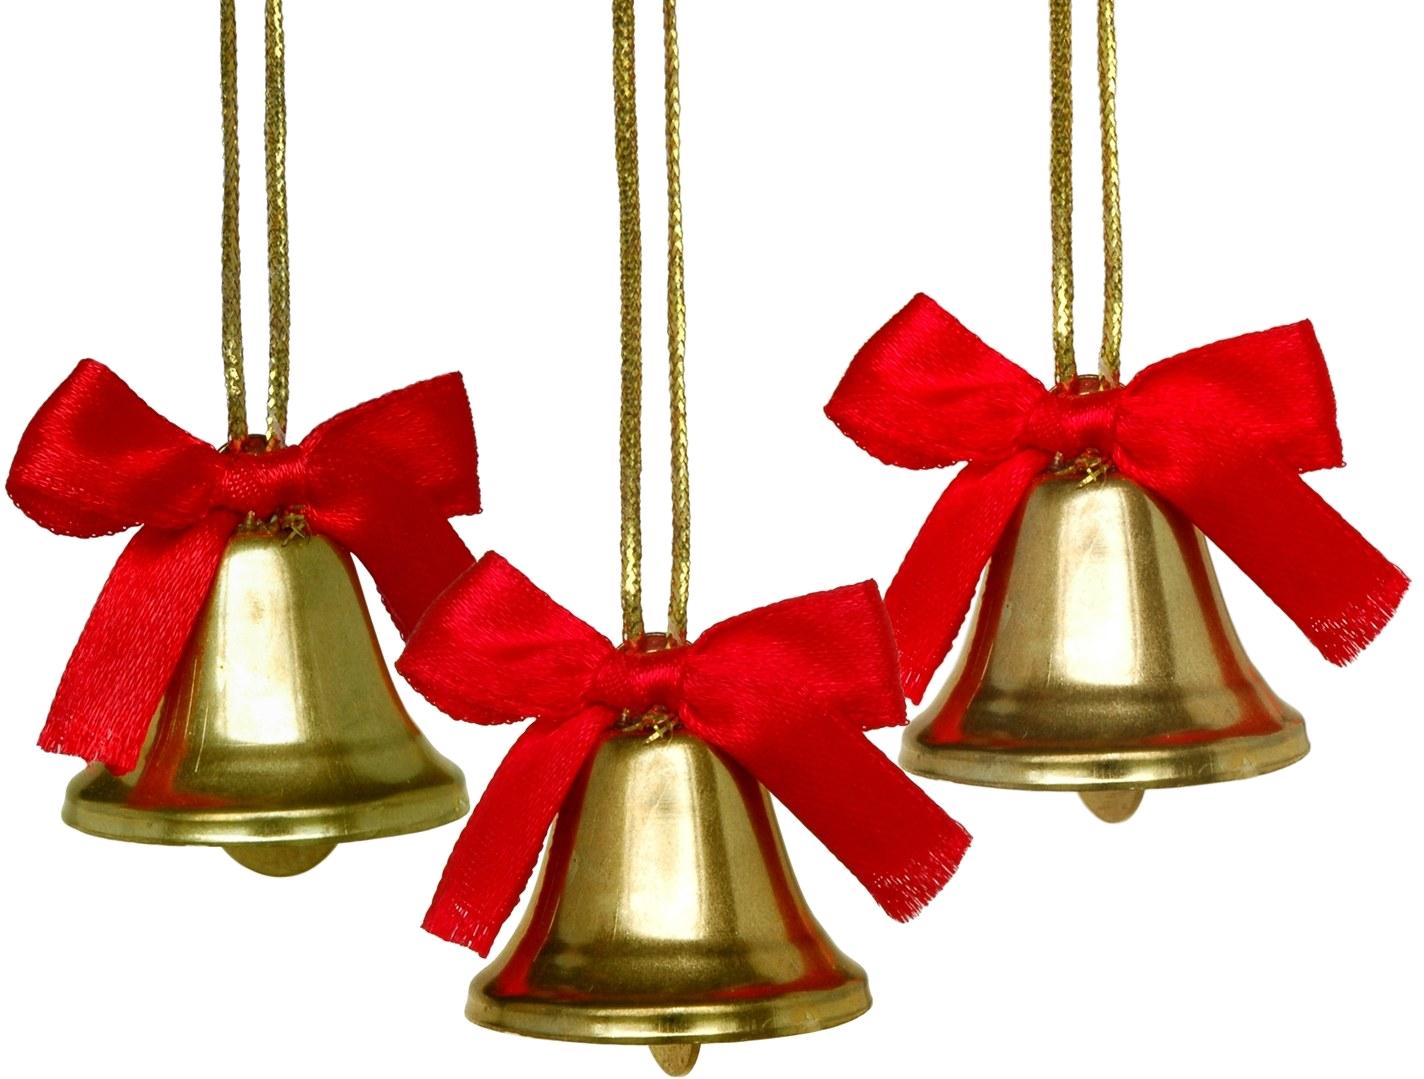 Xmas ornament bell png